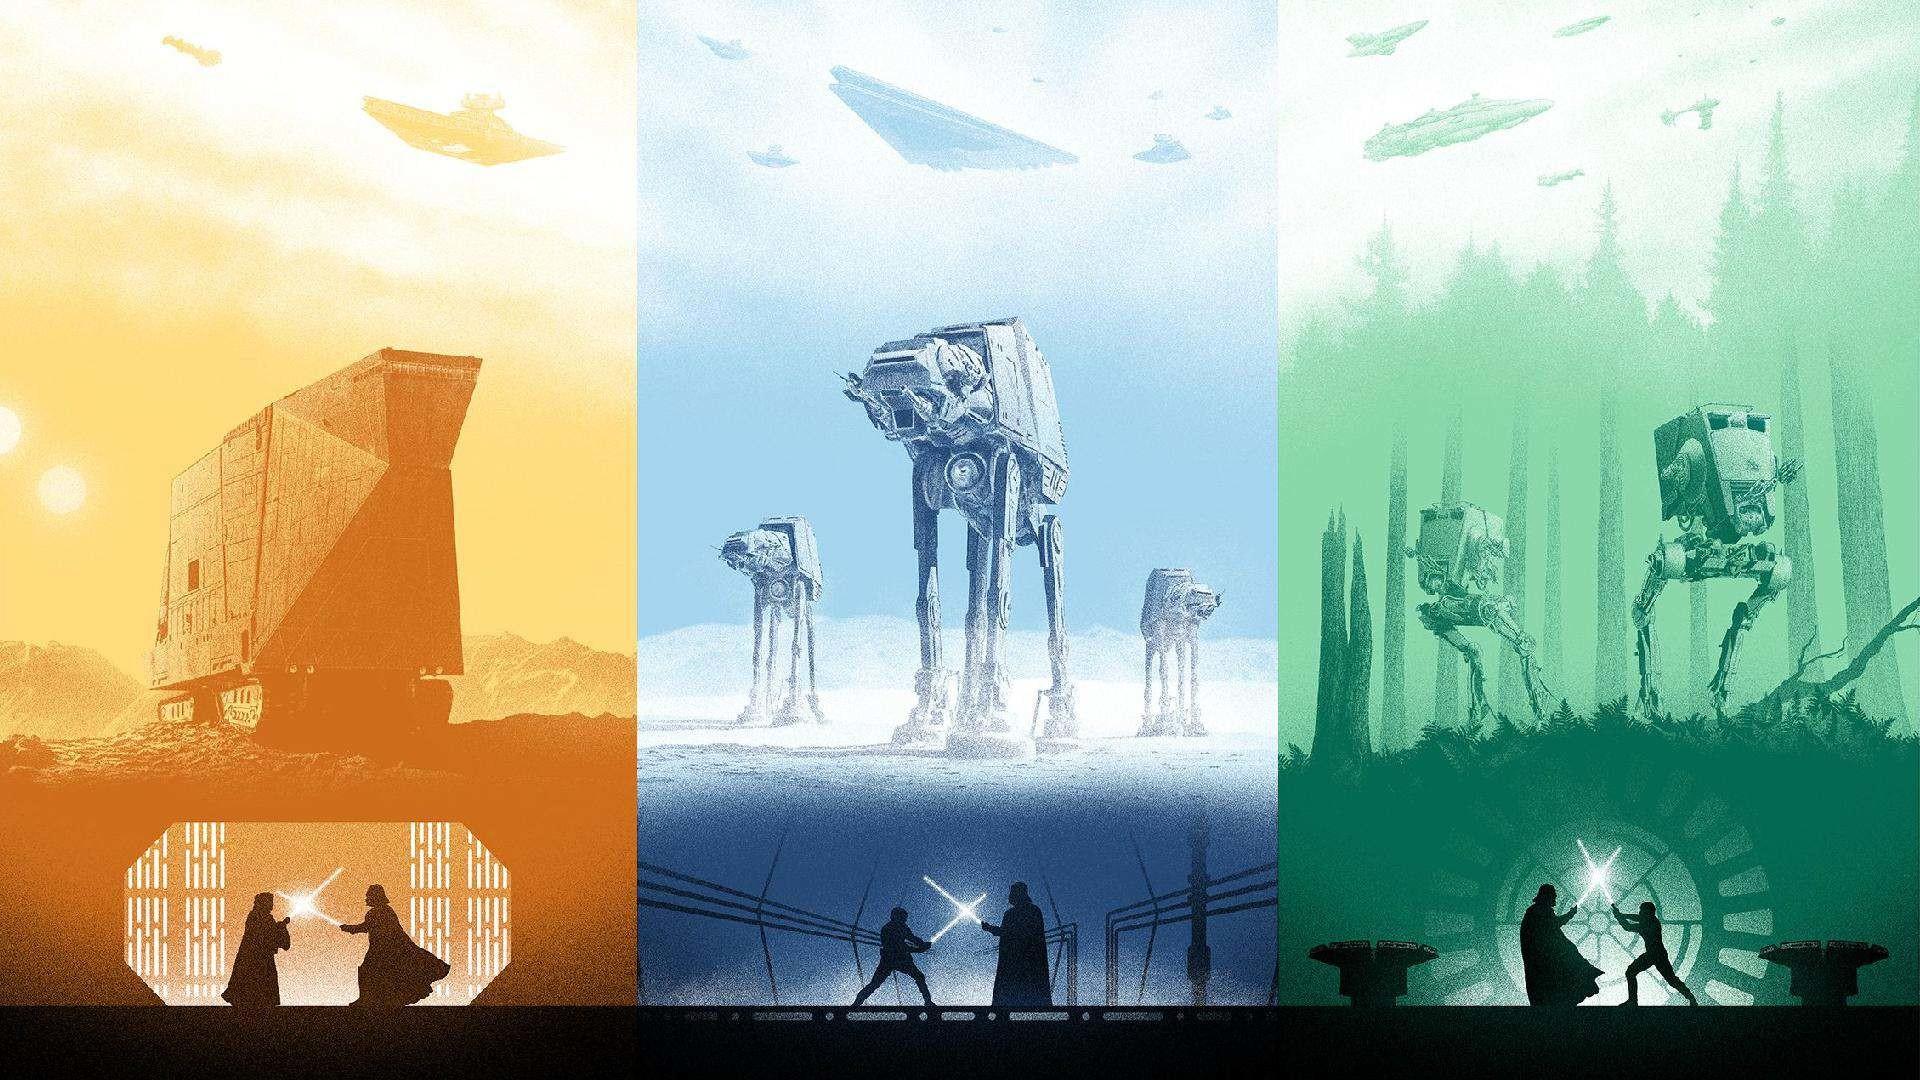 … Star Wars Wallpaper 23 …